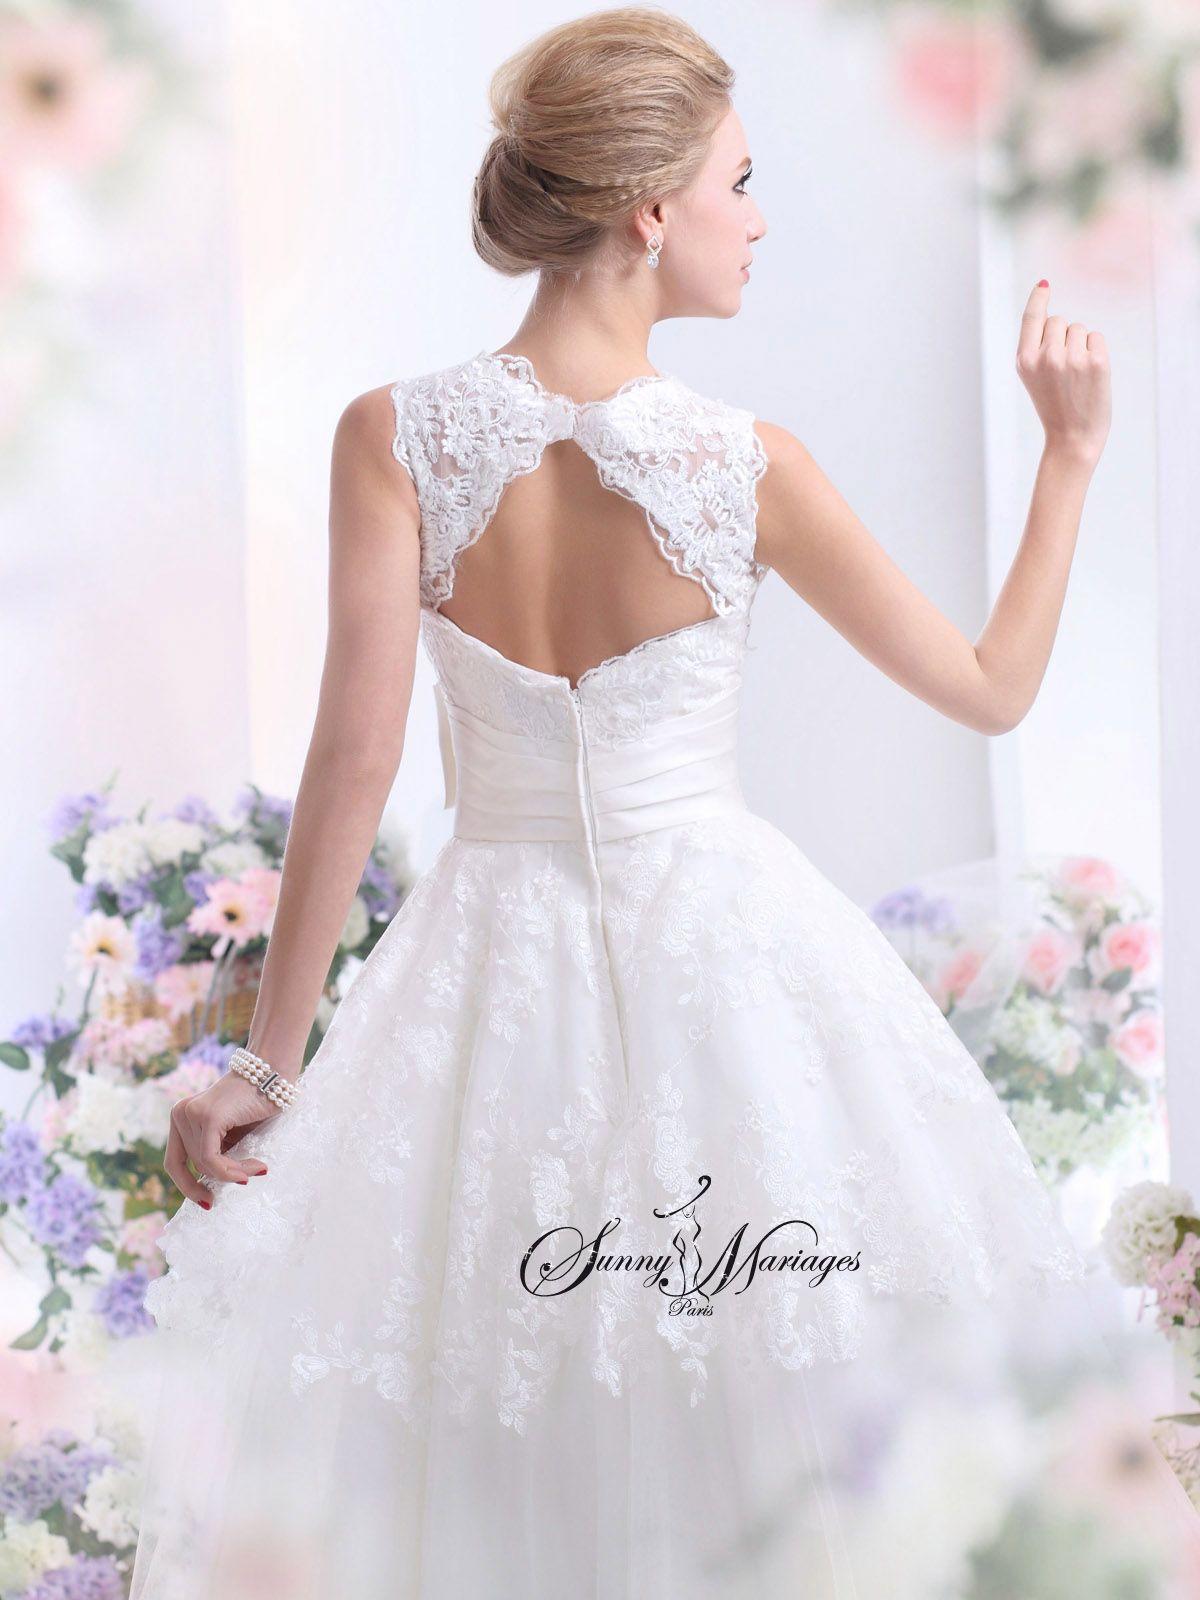 robe de mariee courte avec bustier manche robe mariee. Black Bedroom Furniture Sets. Home Design Ideas